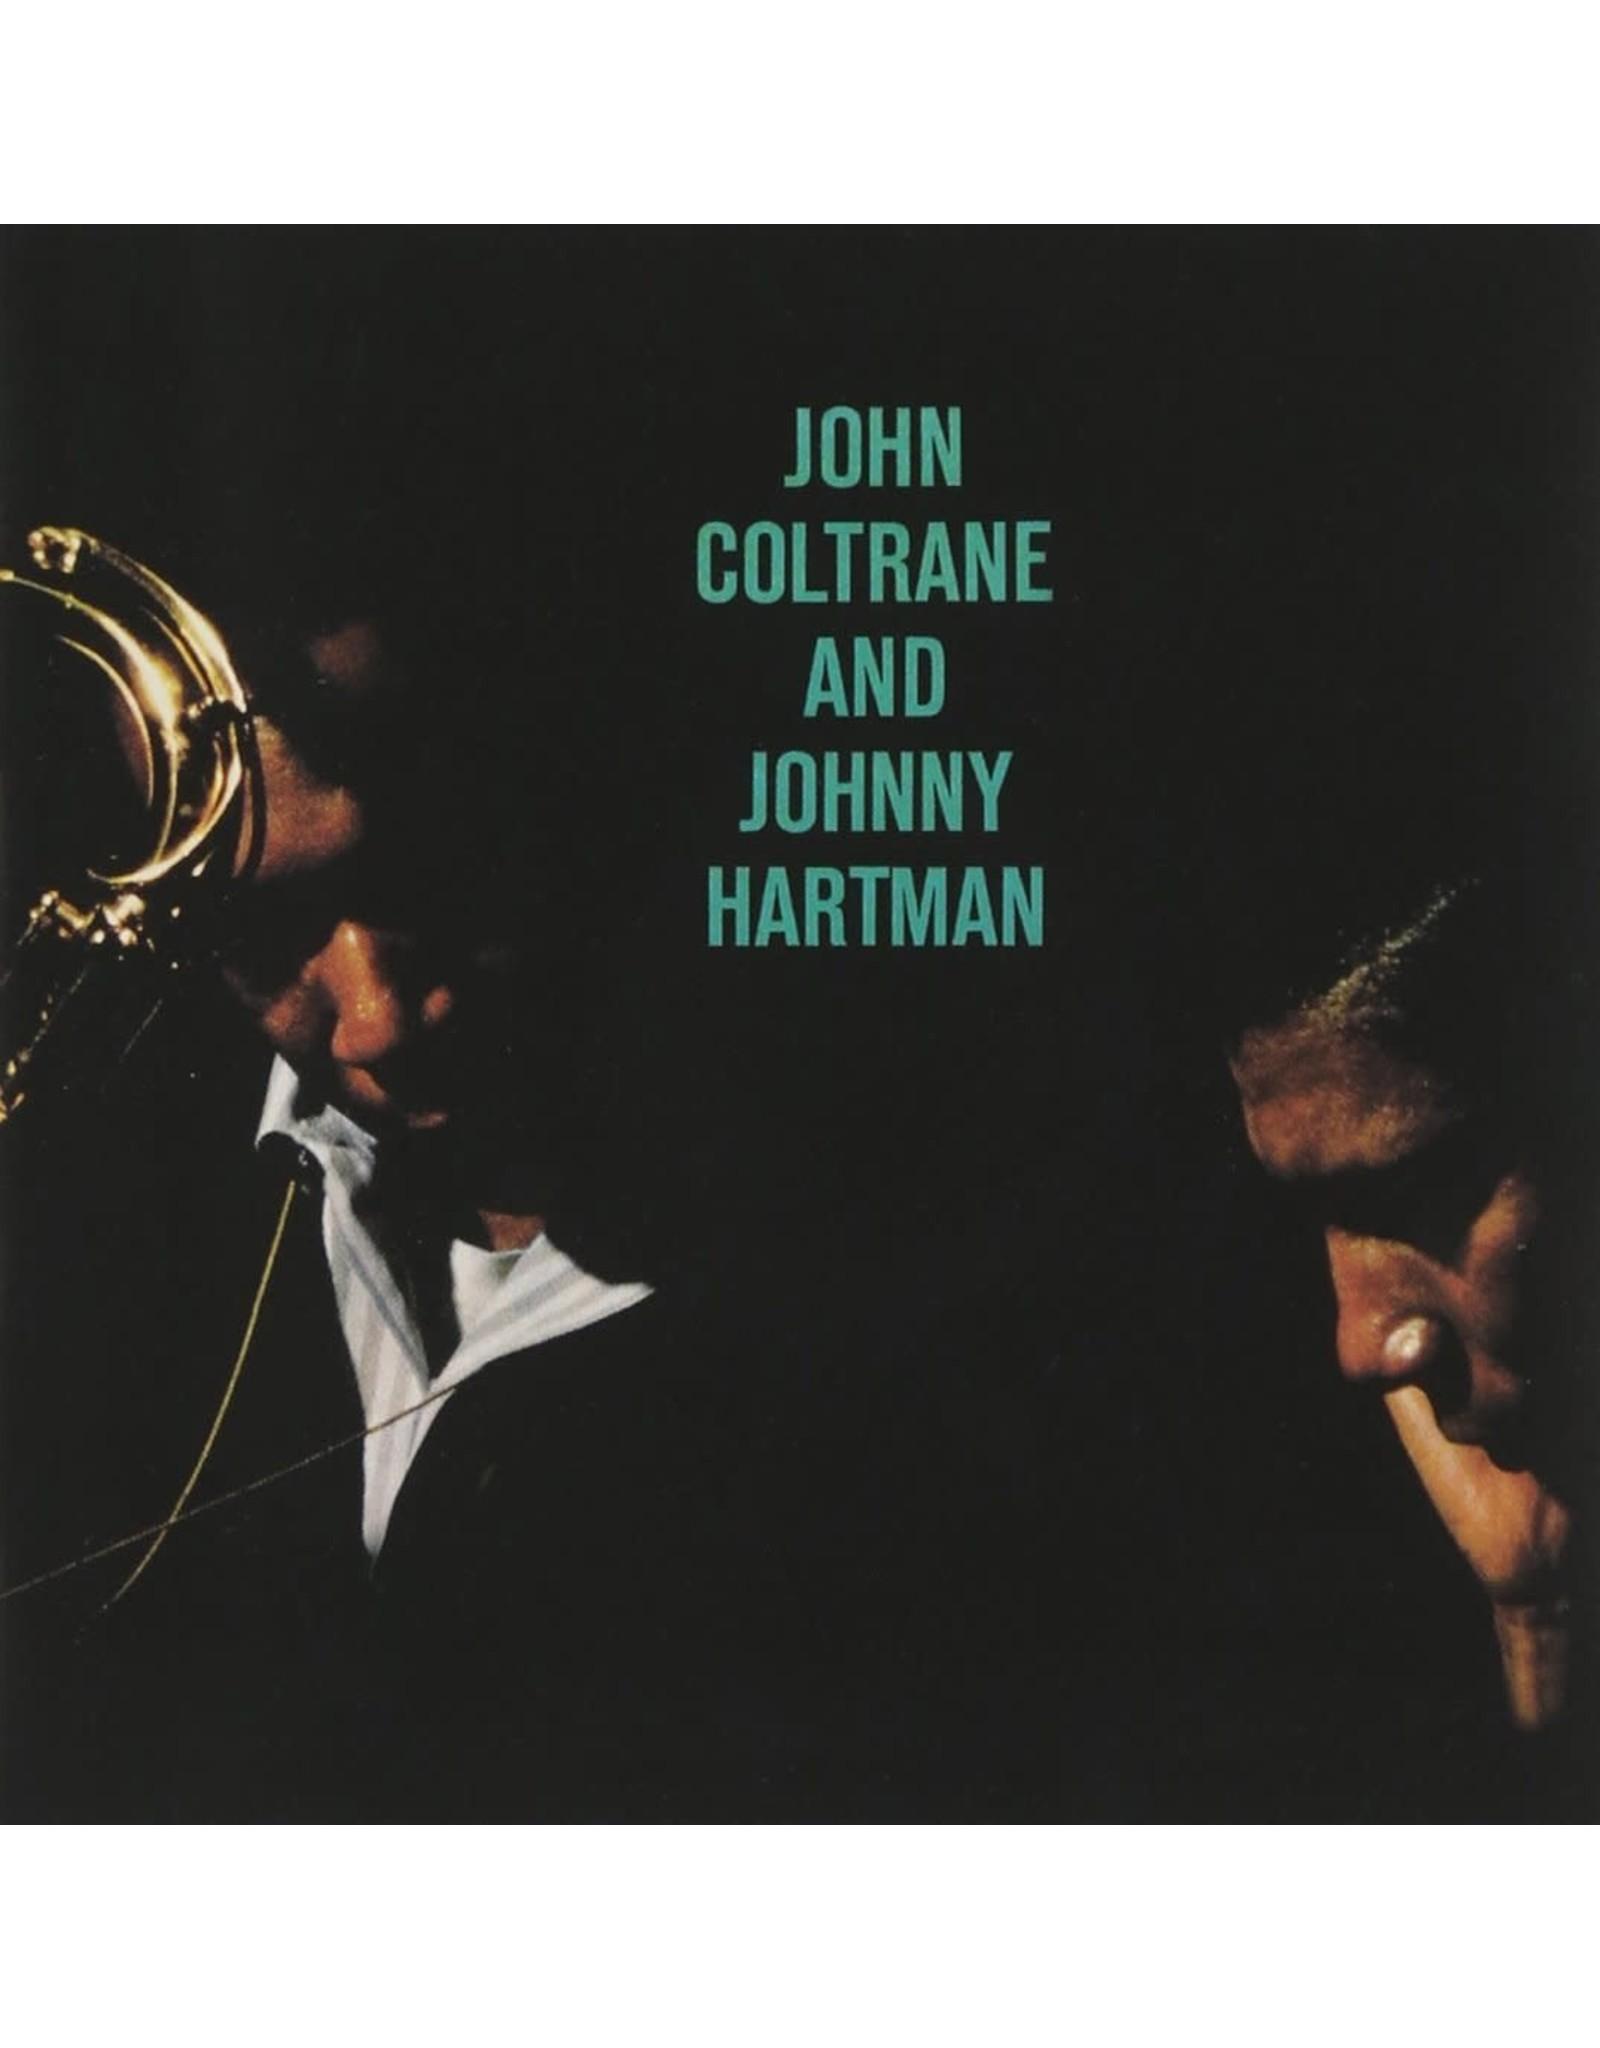 John Coltrane / Johnny Hartman - John Coltrane & Johnny Hartman